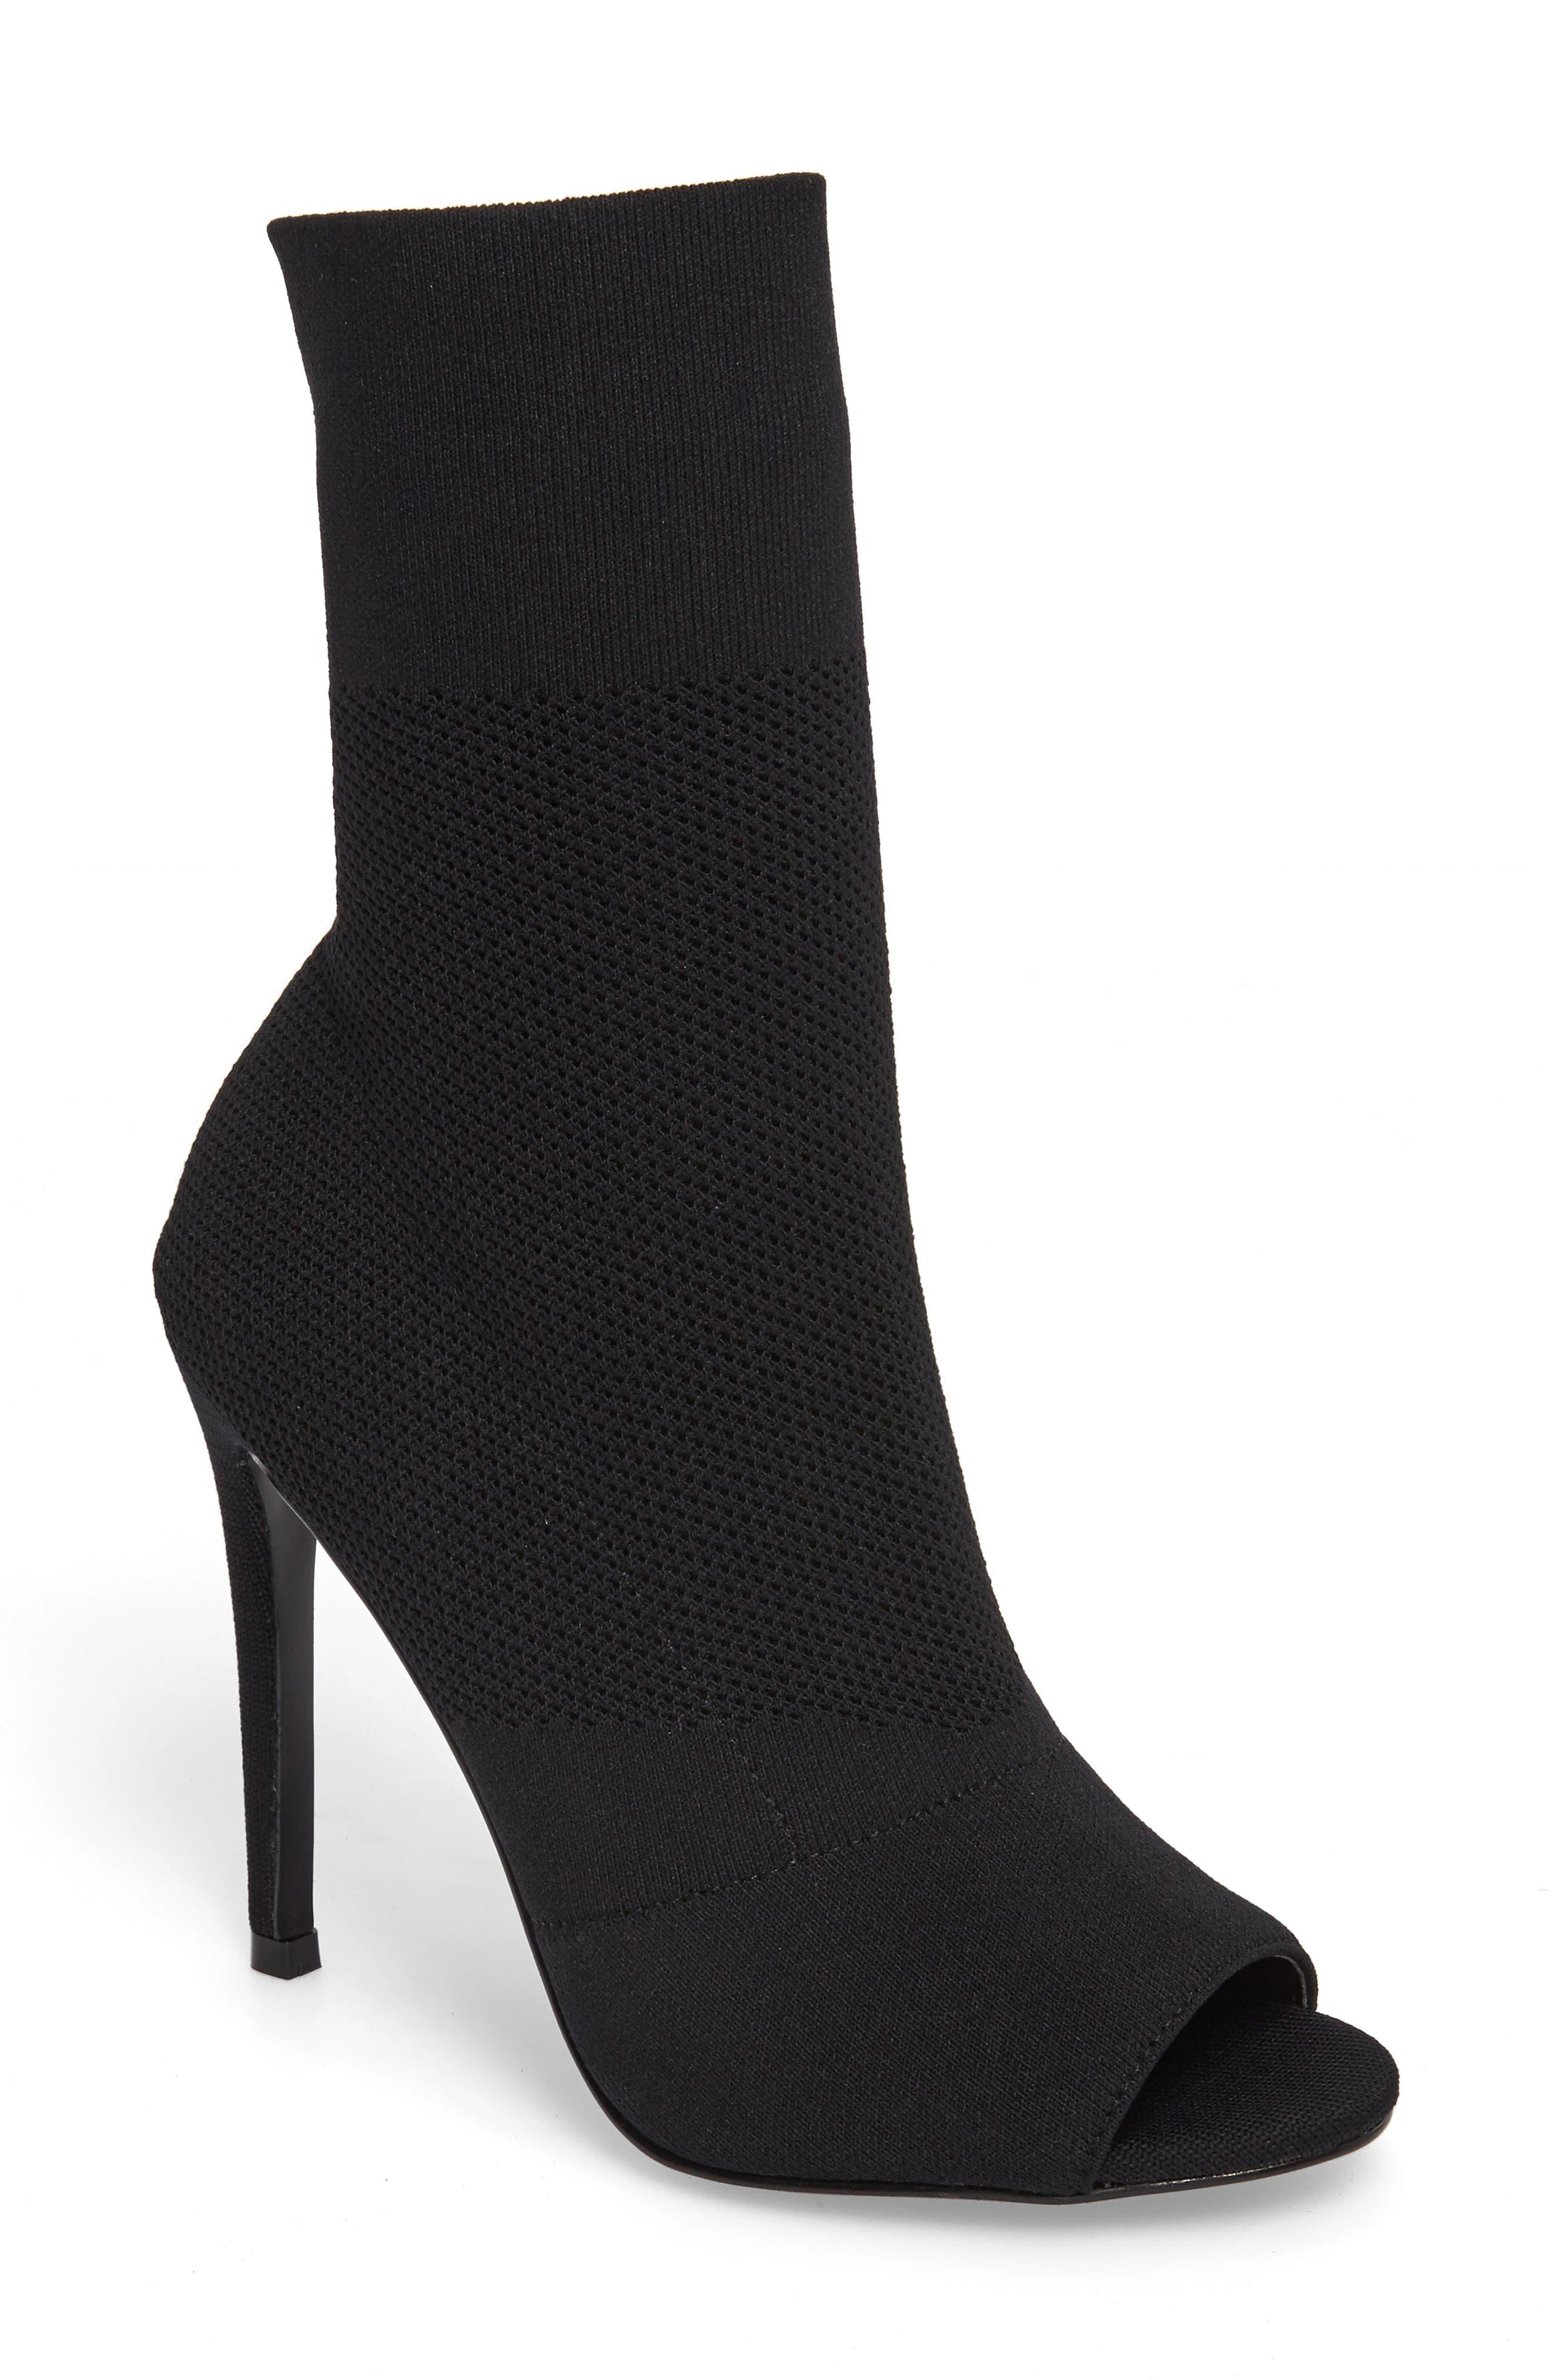 Kristi Peep Toe Bootie,                         Main,                         color, Black Fabric